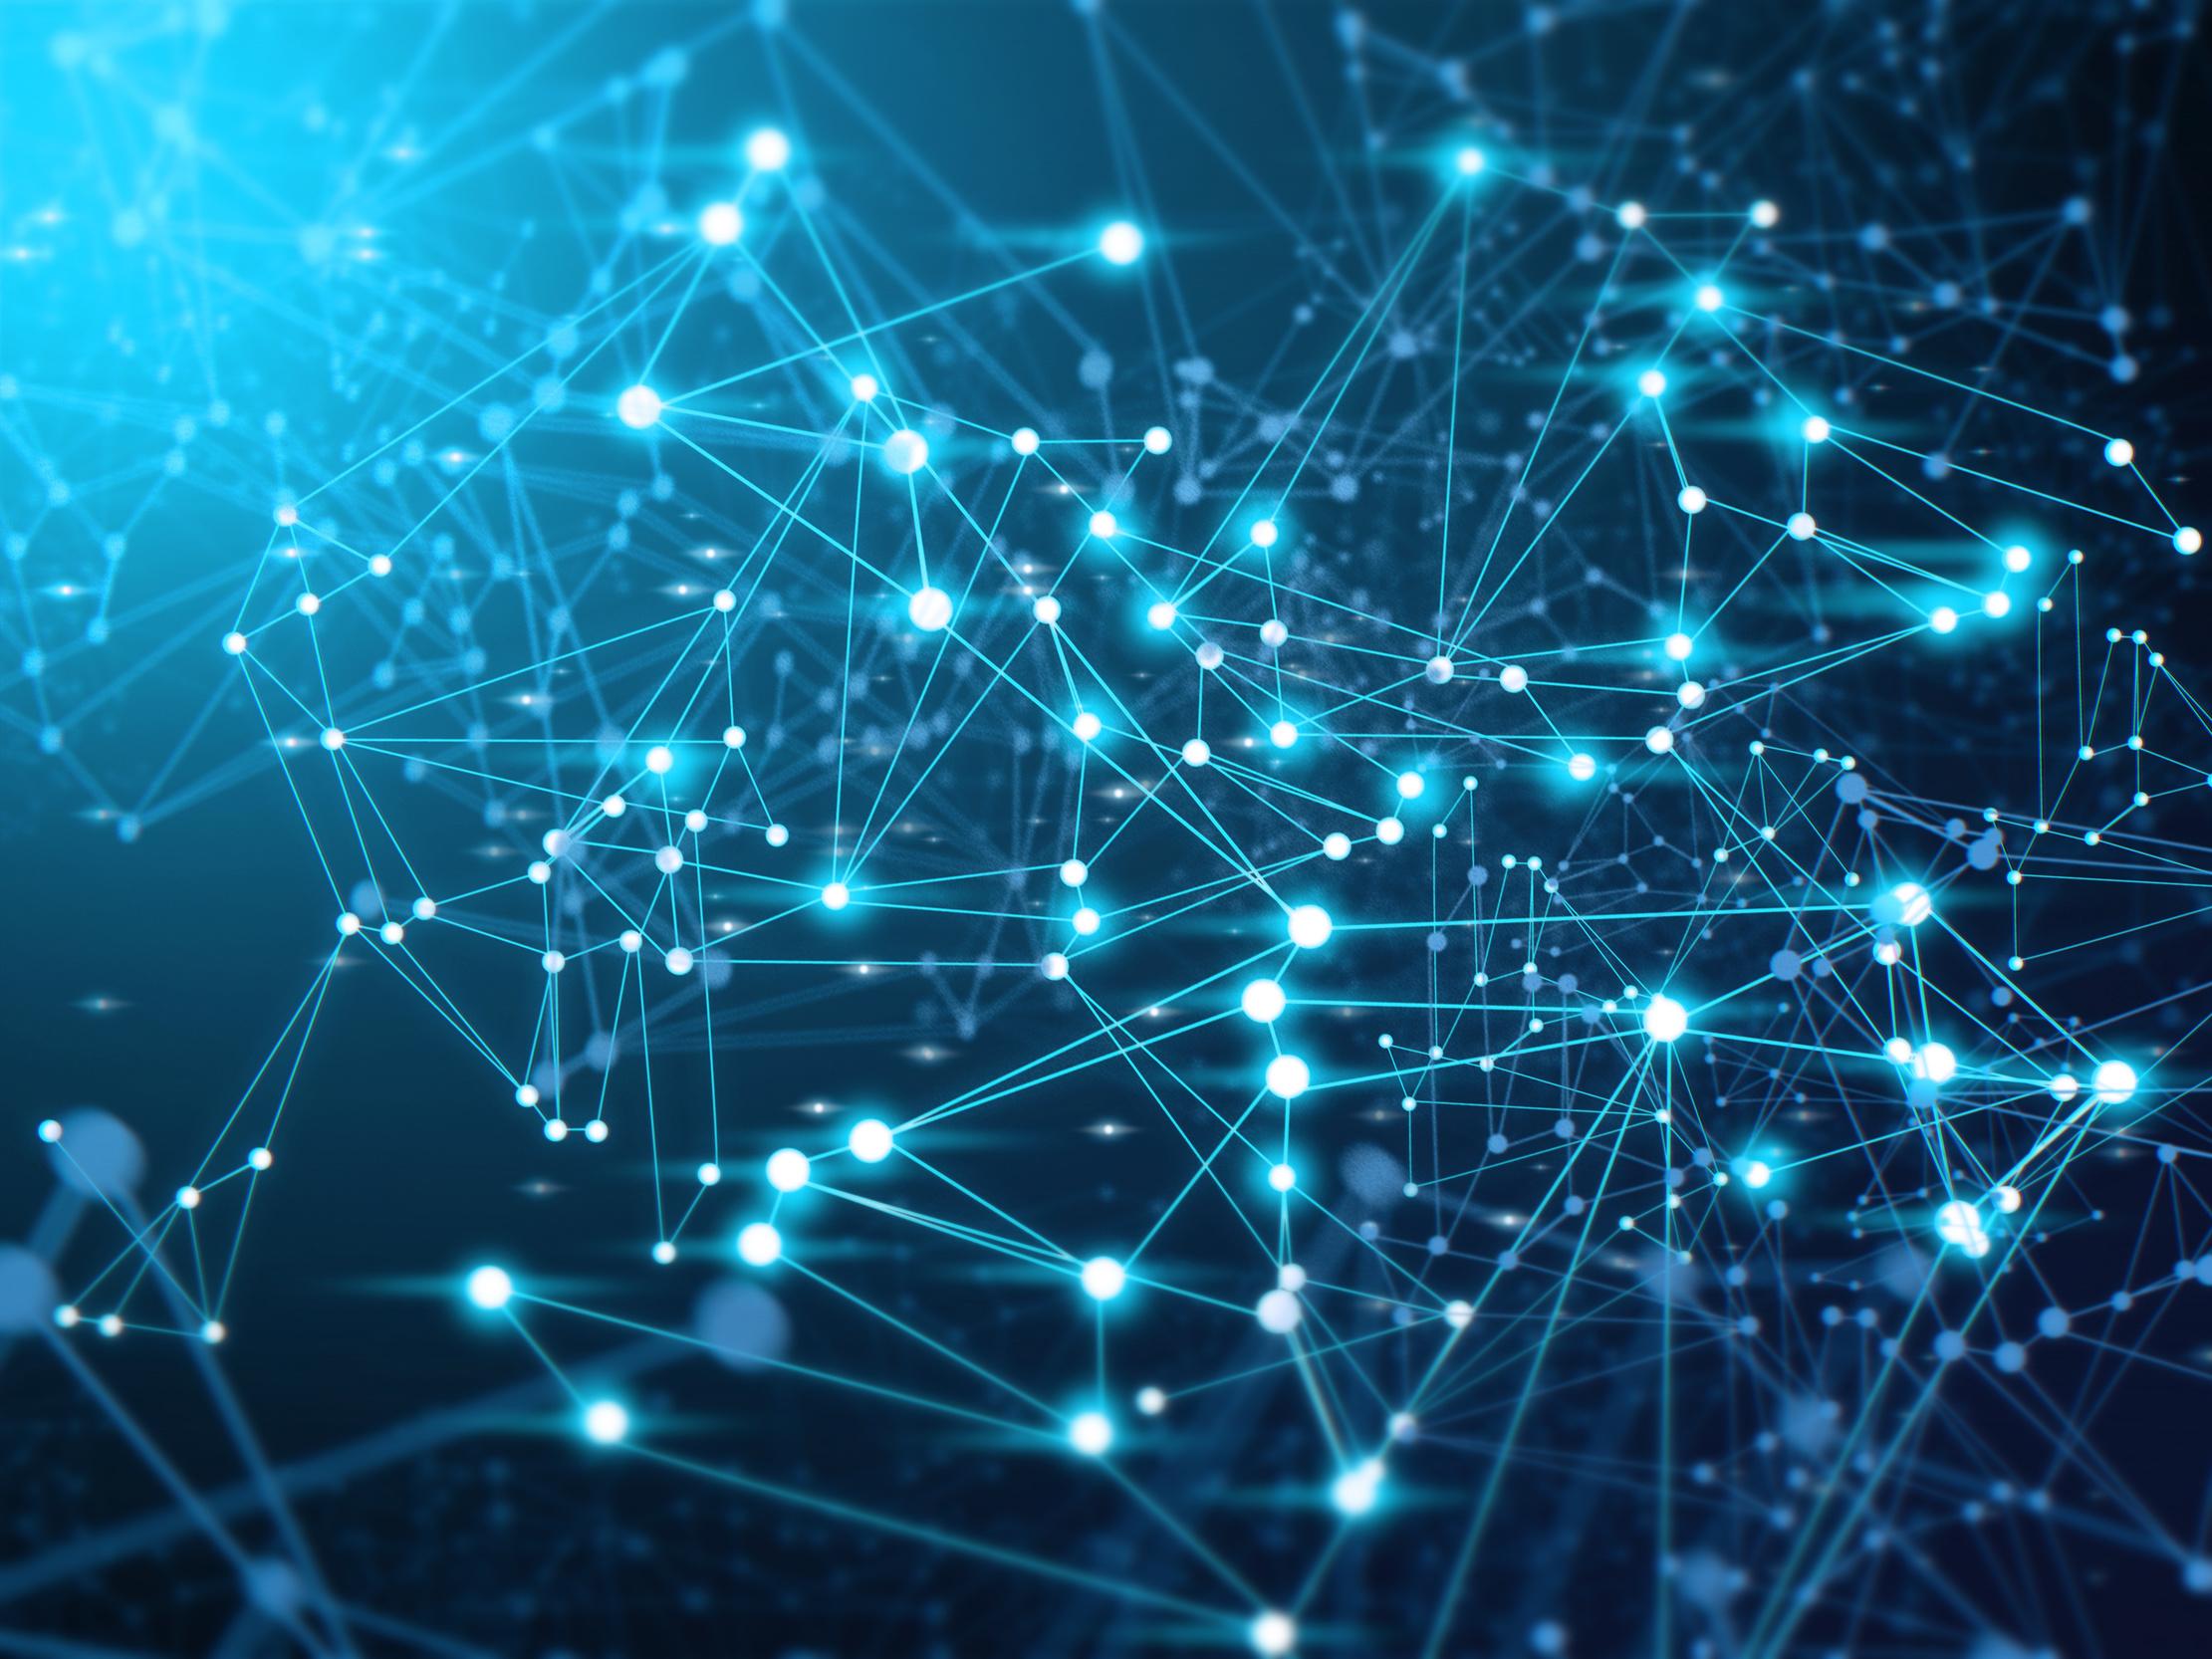 light net connect global web digital internet network